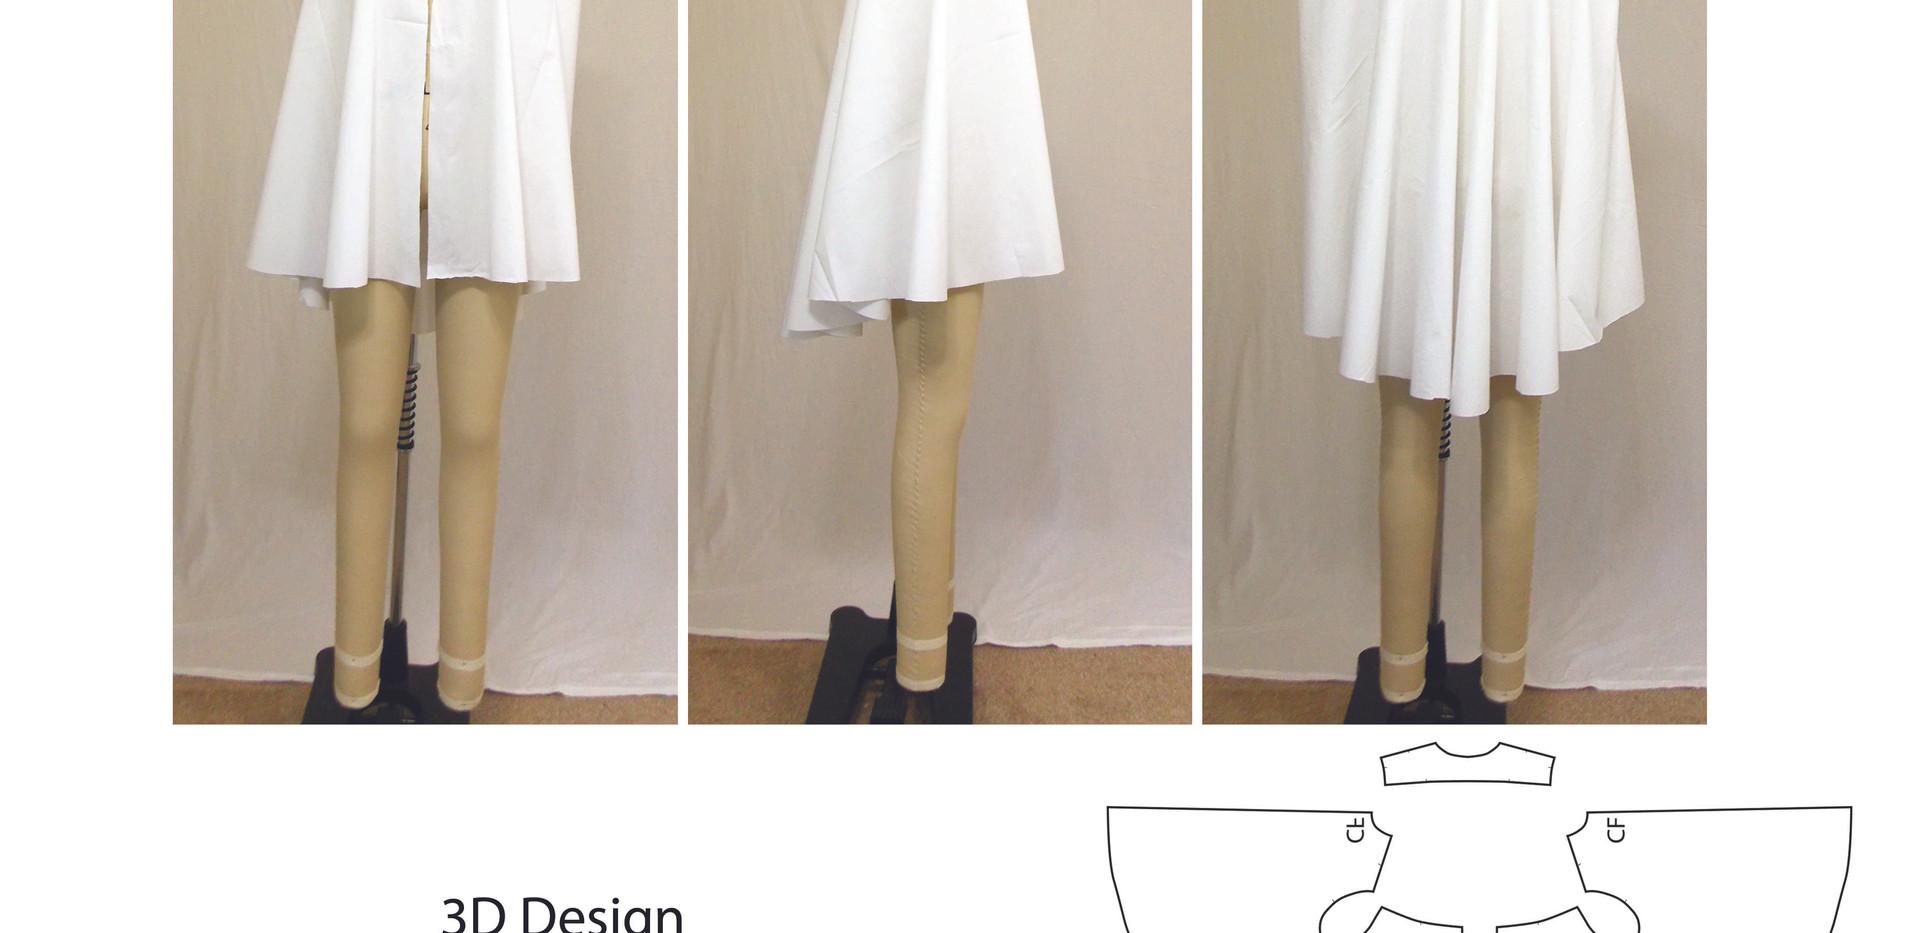 3D Designs